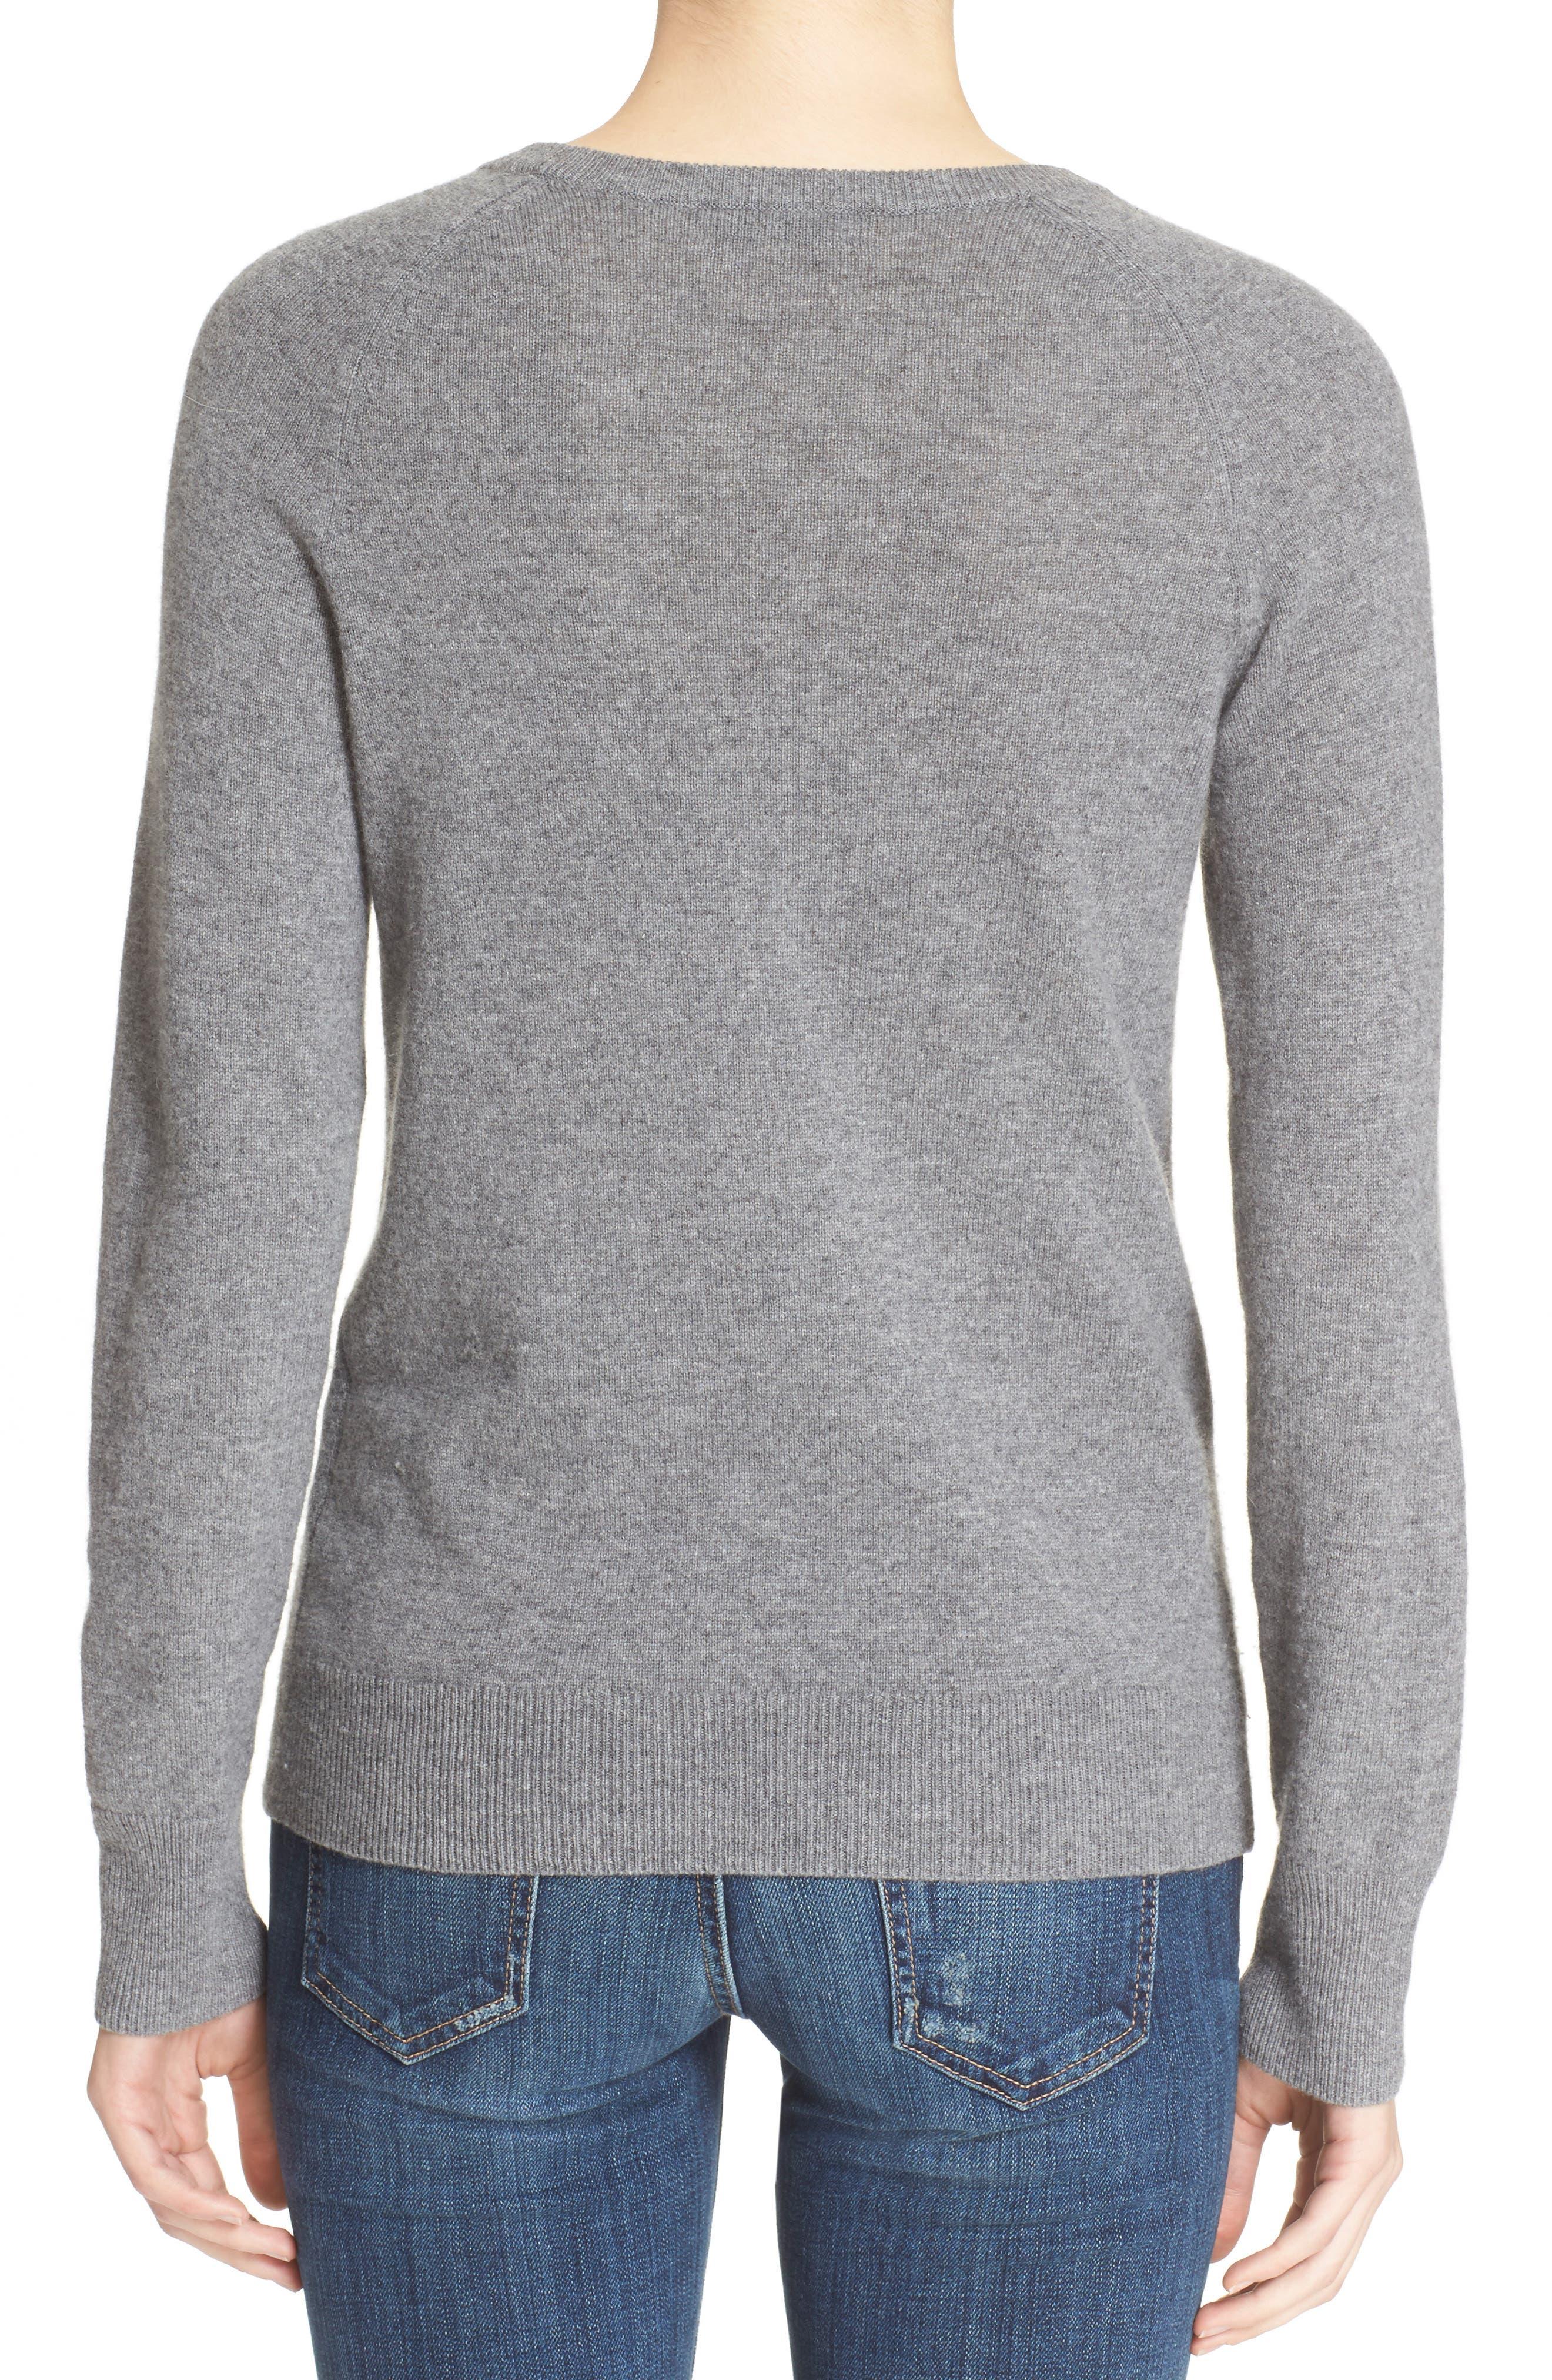 EQUIPMENT, 'Sloane' Crewneck Cashmere Sweater, Alternate thumbnail 2, color, 021